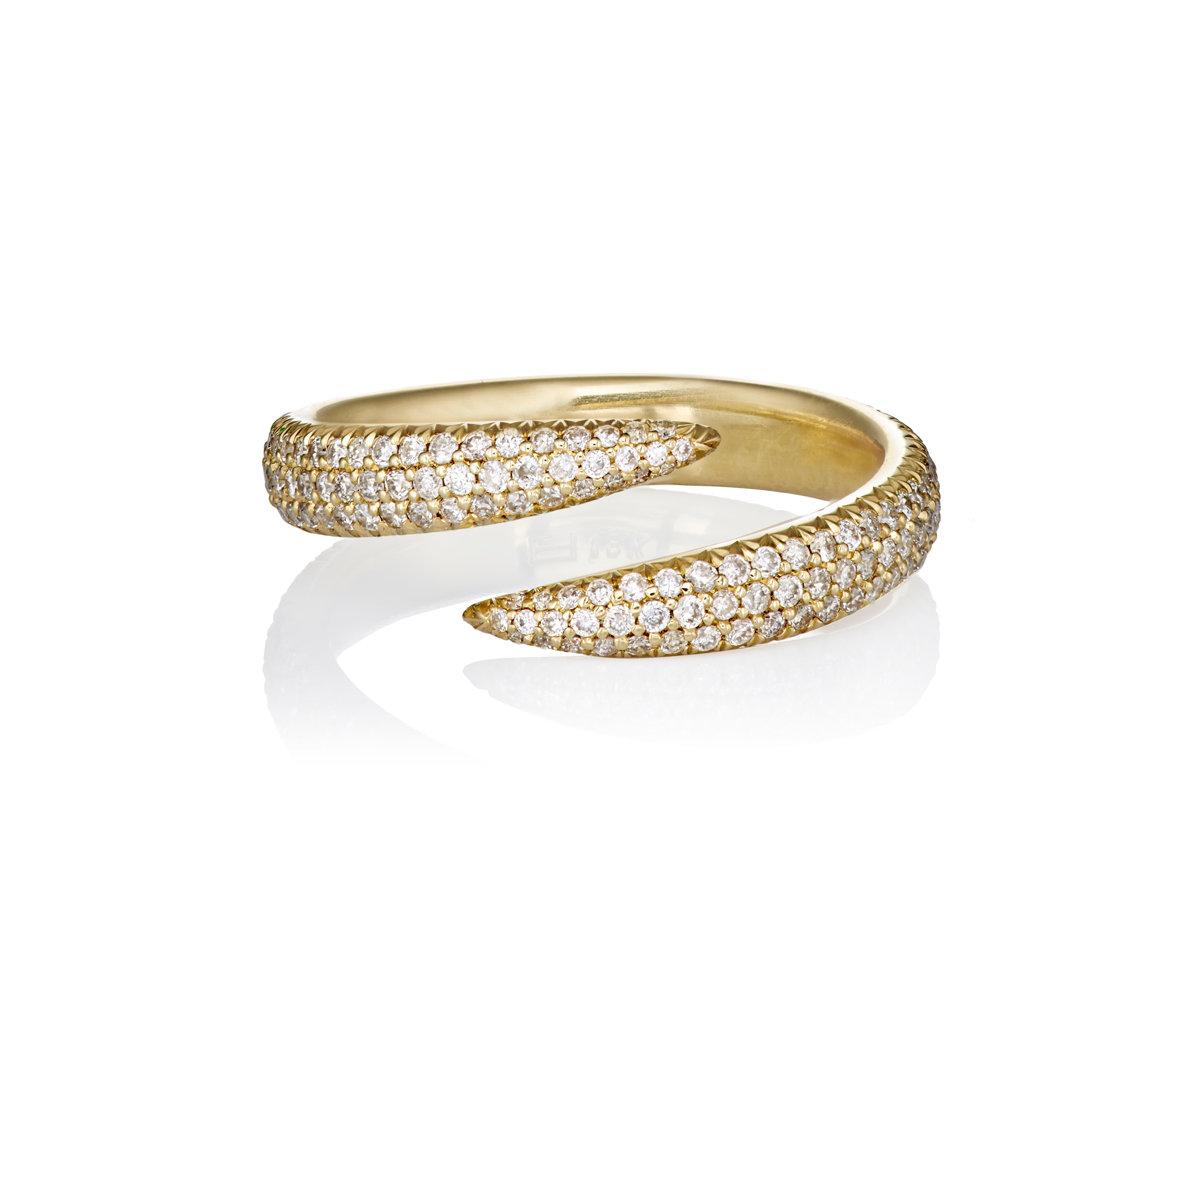 Eva Fehren Wrap Claw Pave Ring in Metallics KKKPv